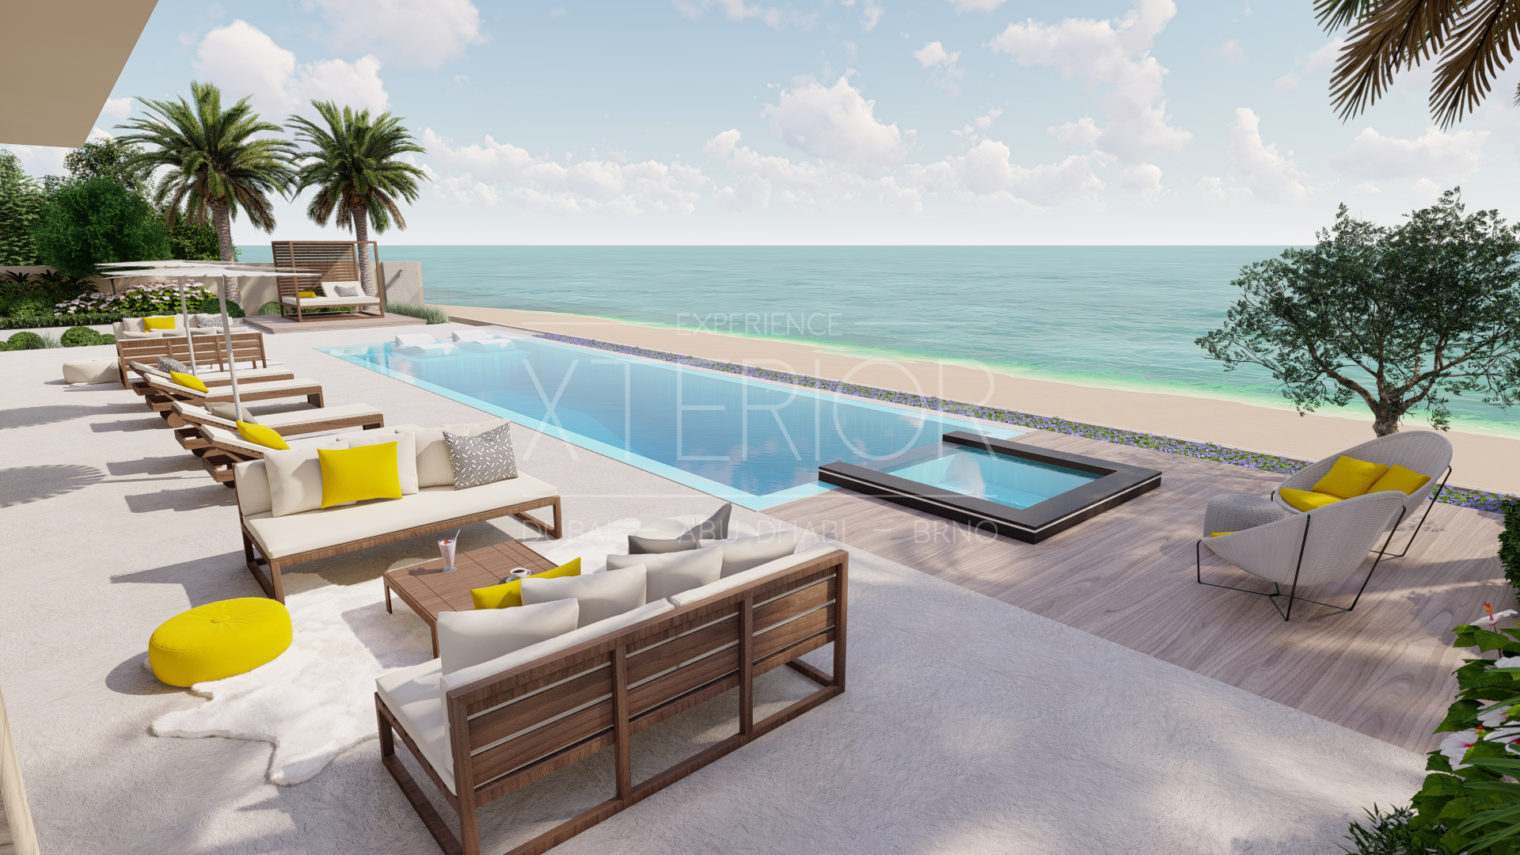 Swimming pool contractor in Dubai